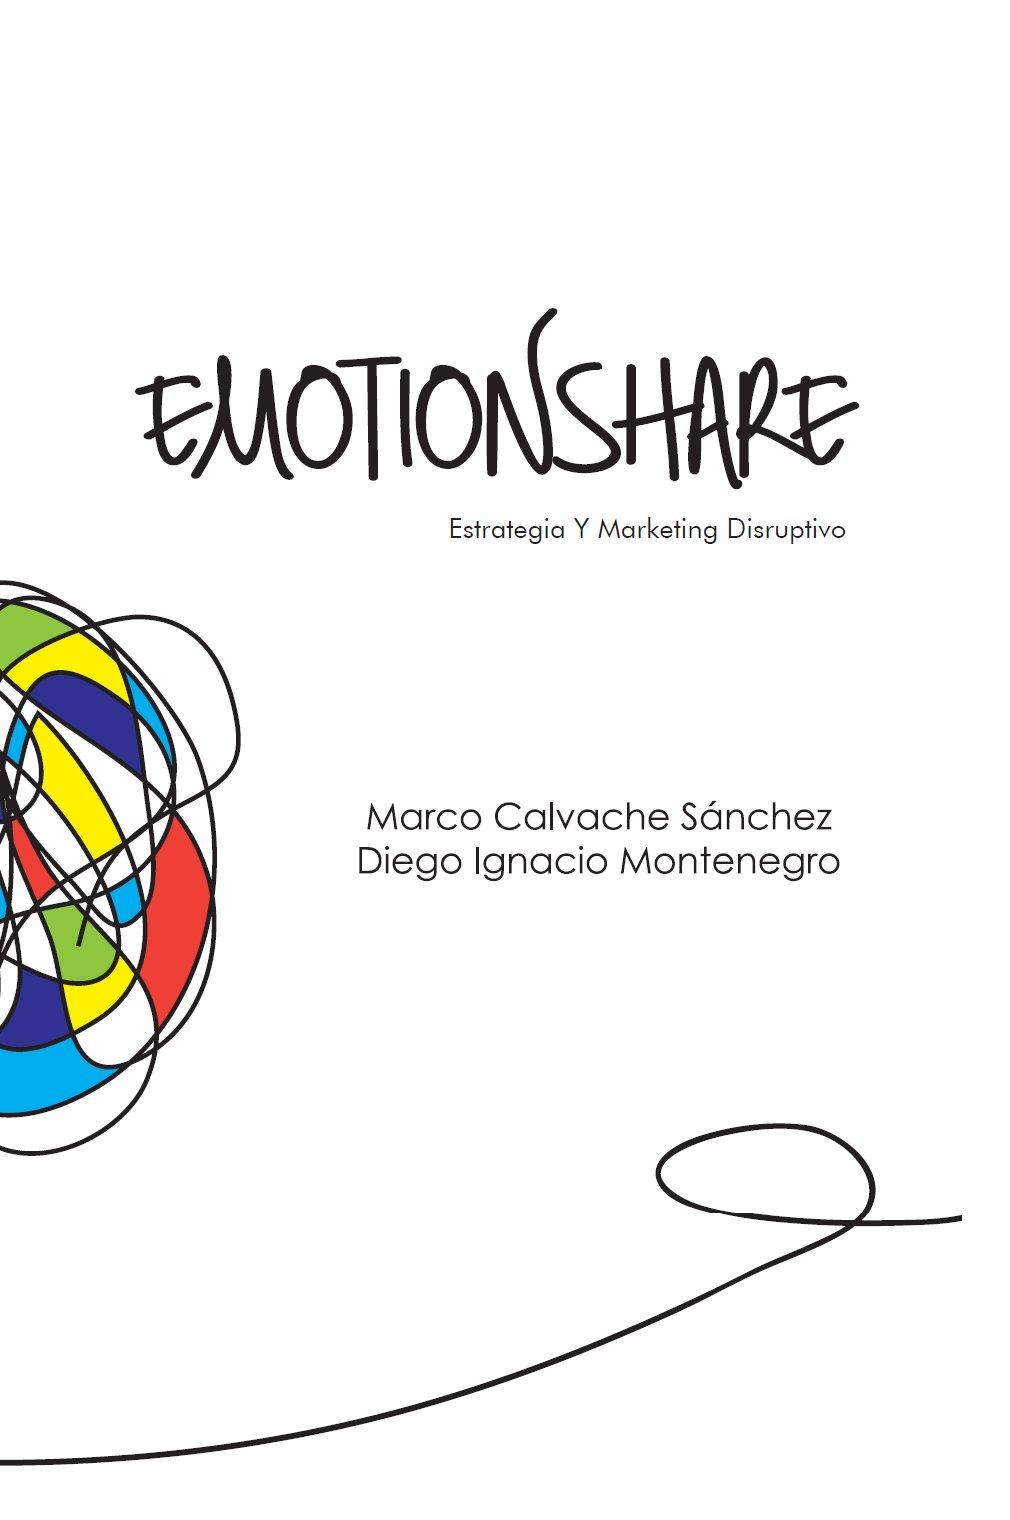 Emotionshare: Estrategia Y Marketing Disruptivo (Spanish Edition)